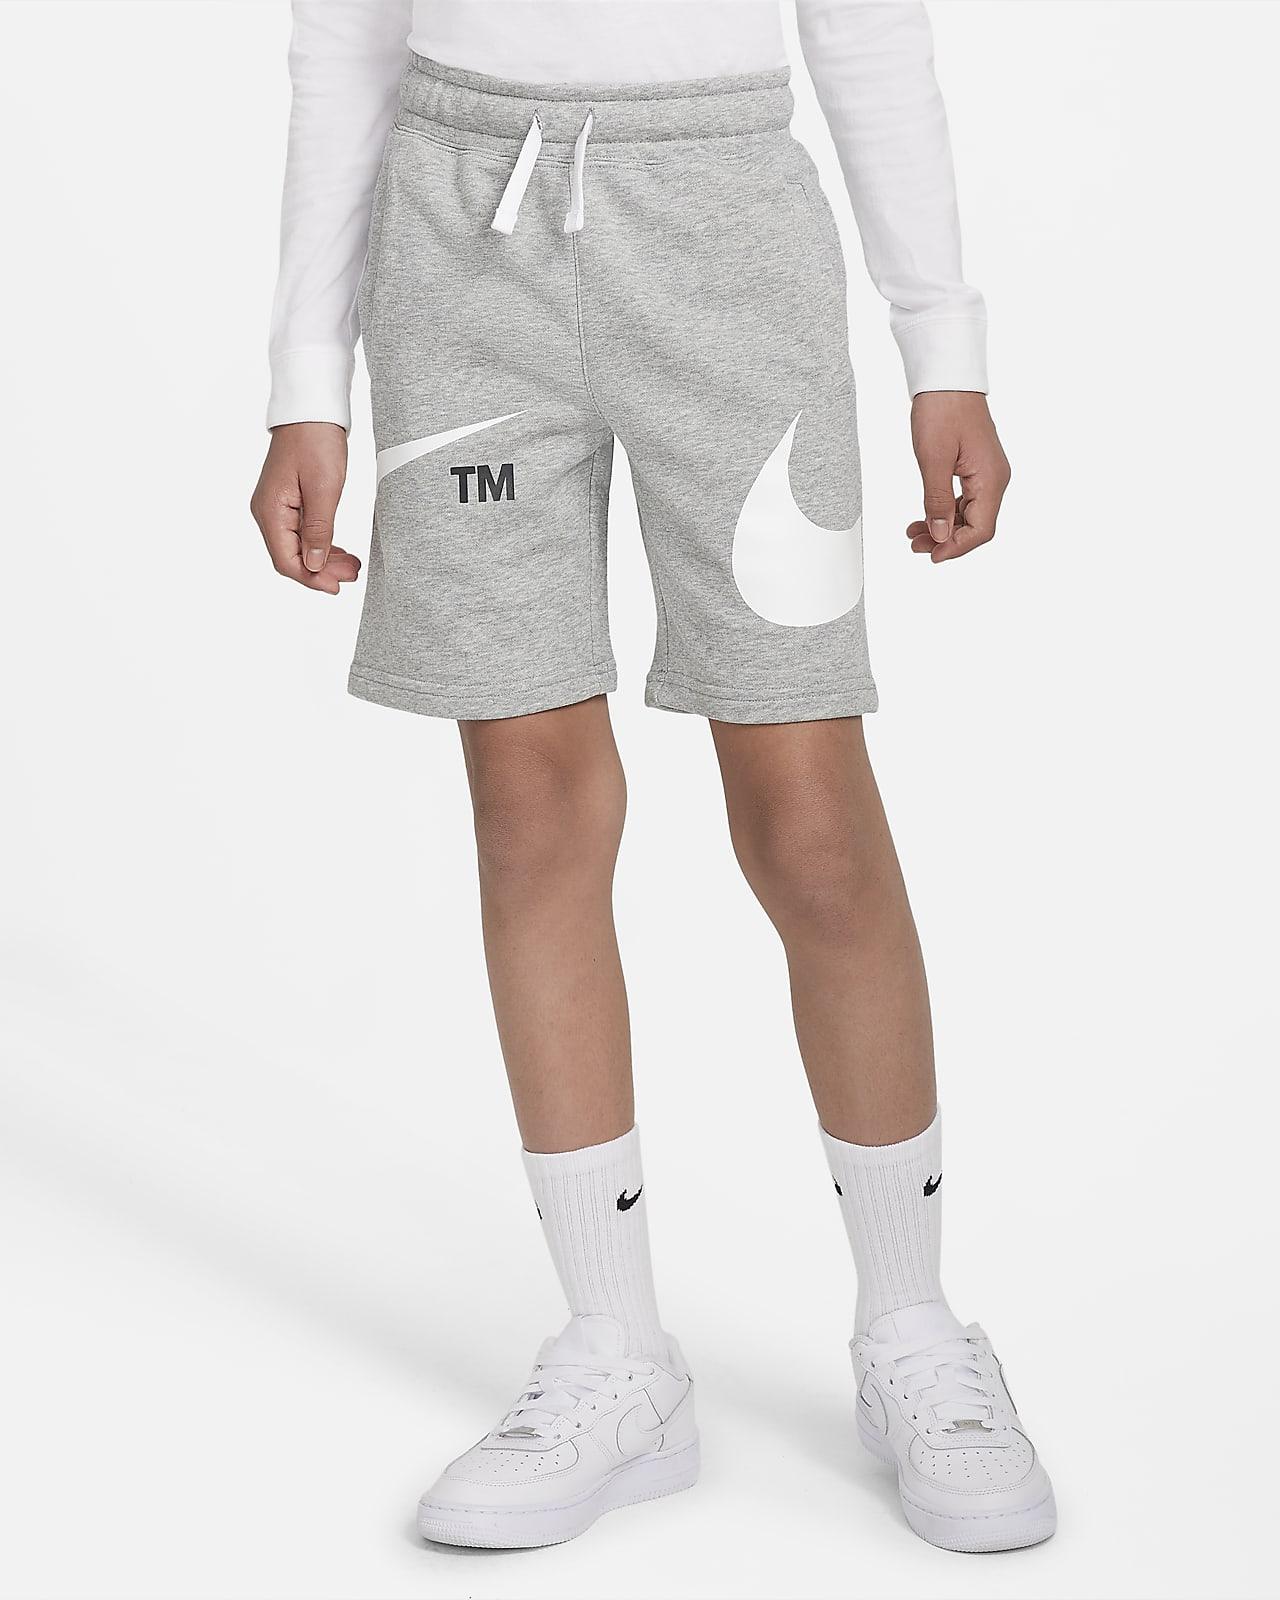 Nike Sportswear Swoosh Genç Çocuk (Erkek) Şortu